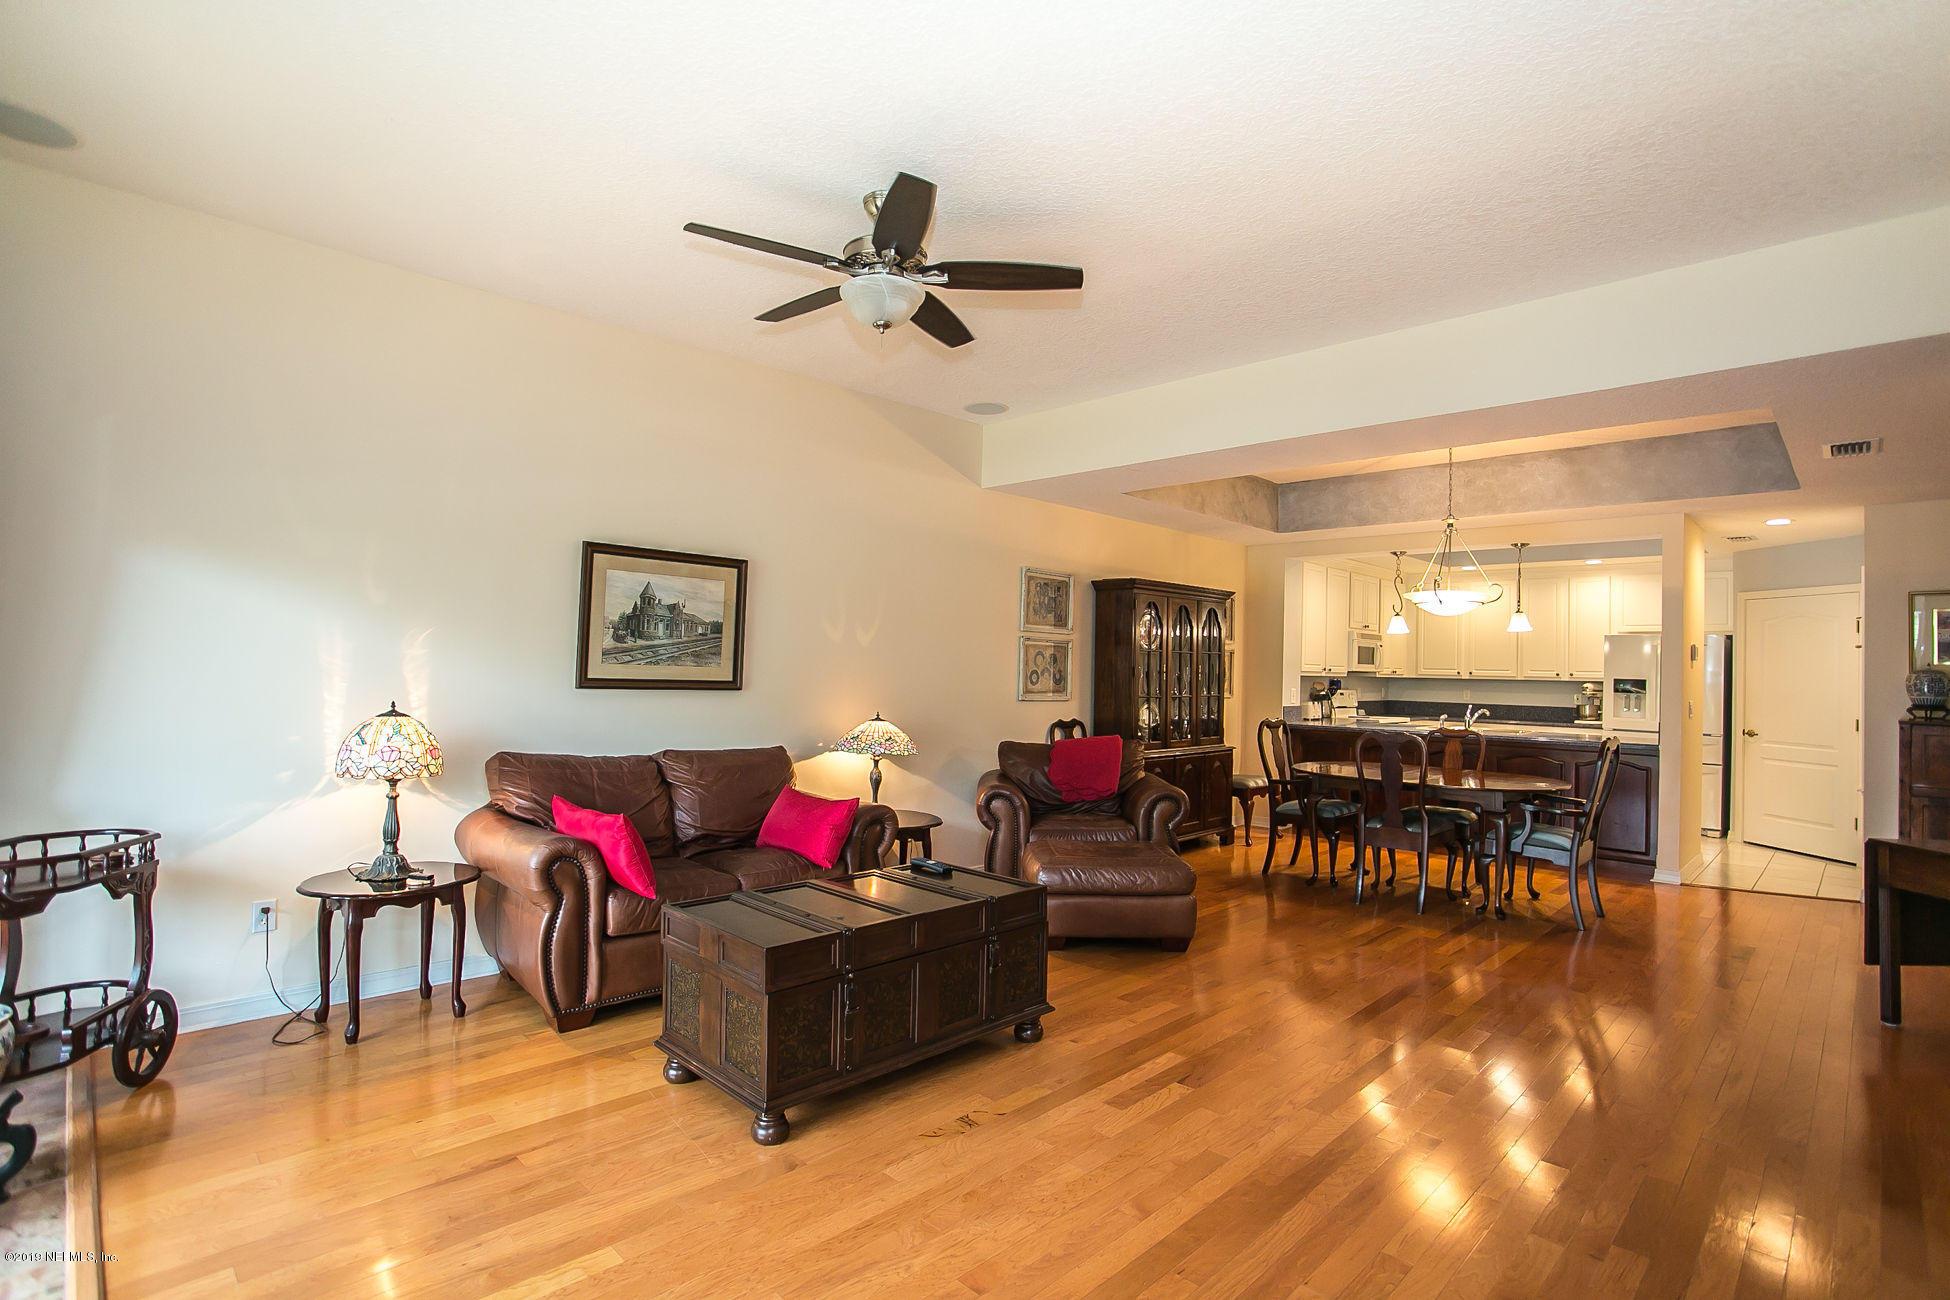 1203 MAKARIOS, ST AUGUSTINE, FLORIDA 32080, 2 Bedrooms Bedrooms, ,2 BathroomsBathrooms,Condo,For sale,MAKARIOS,990687